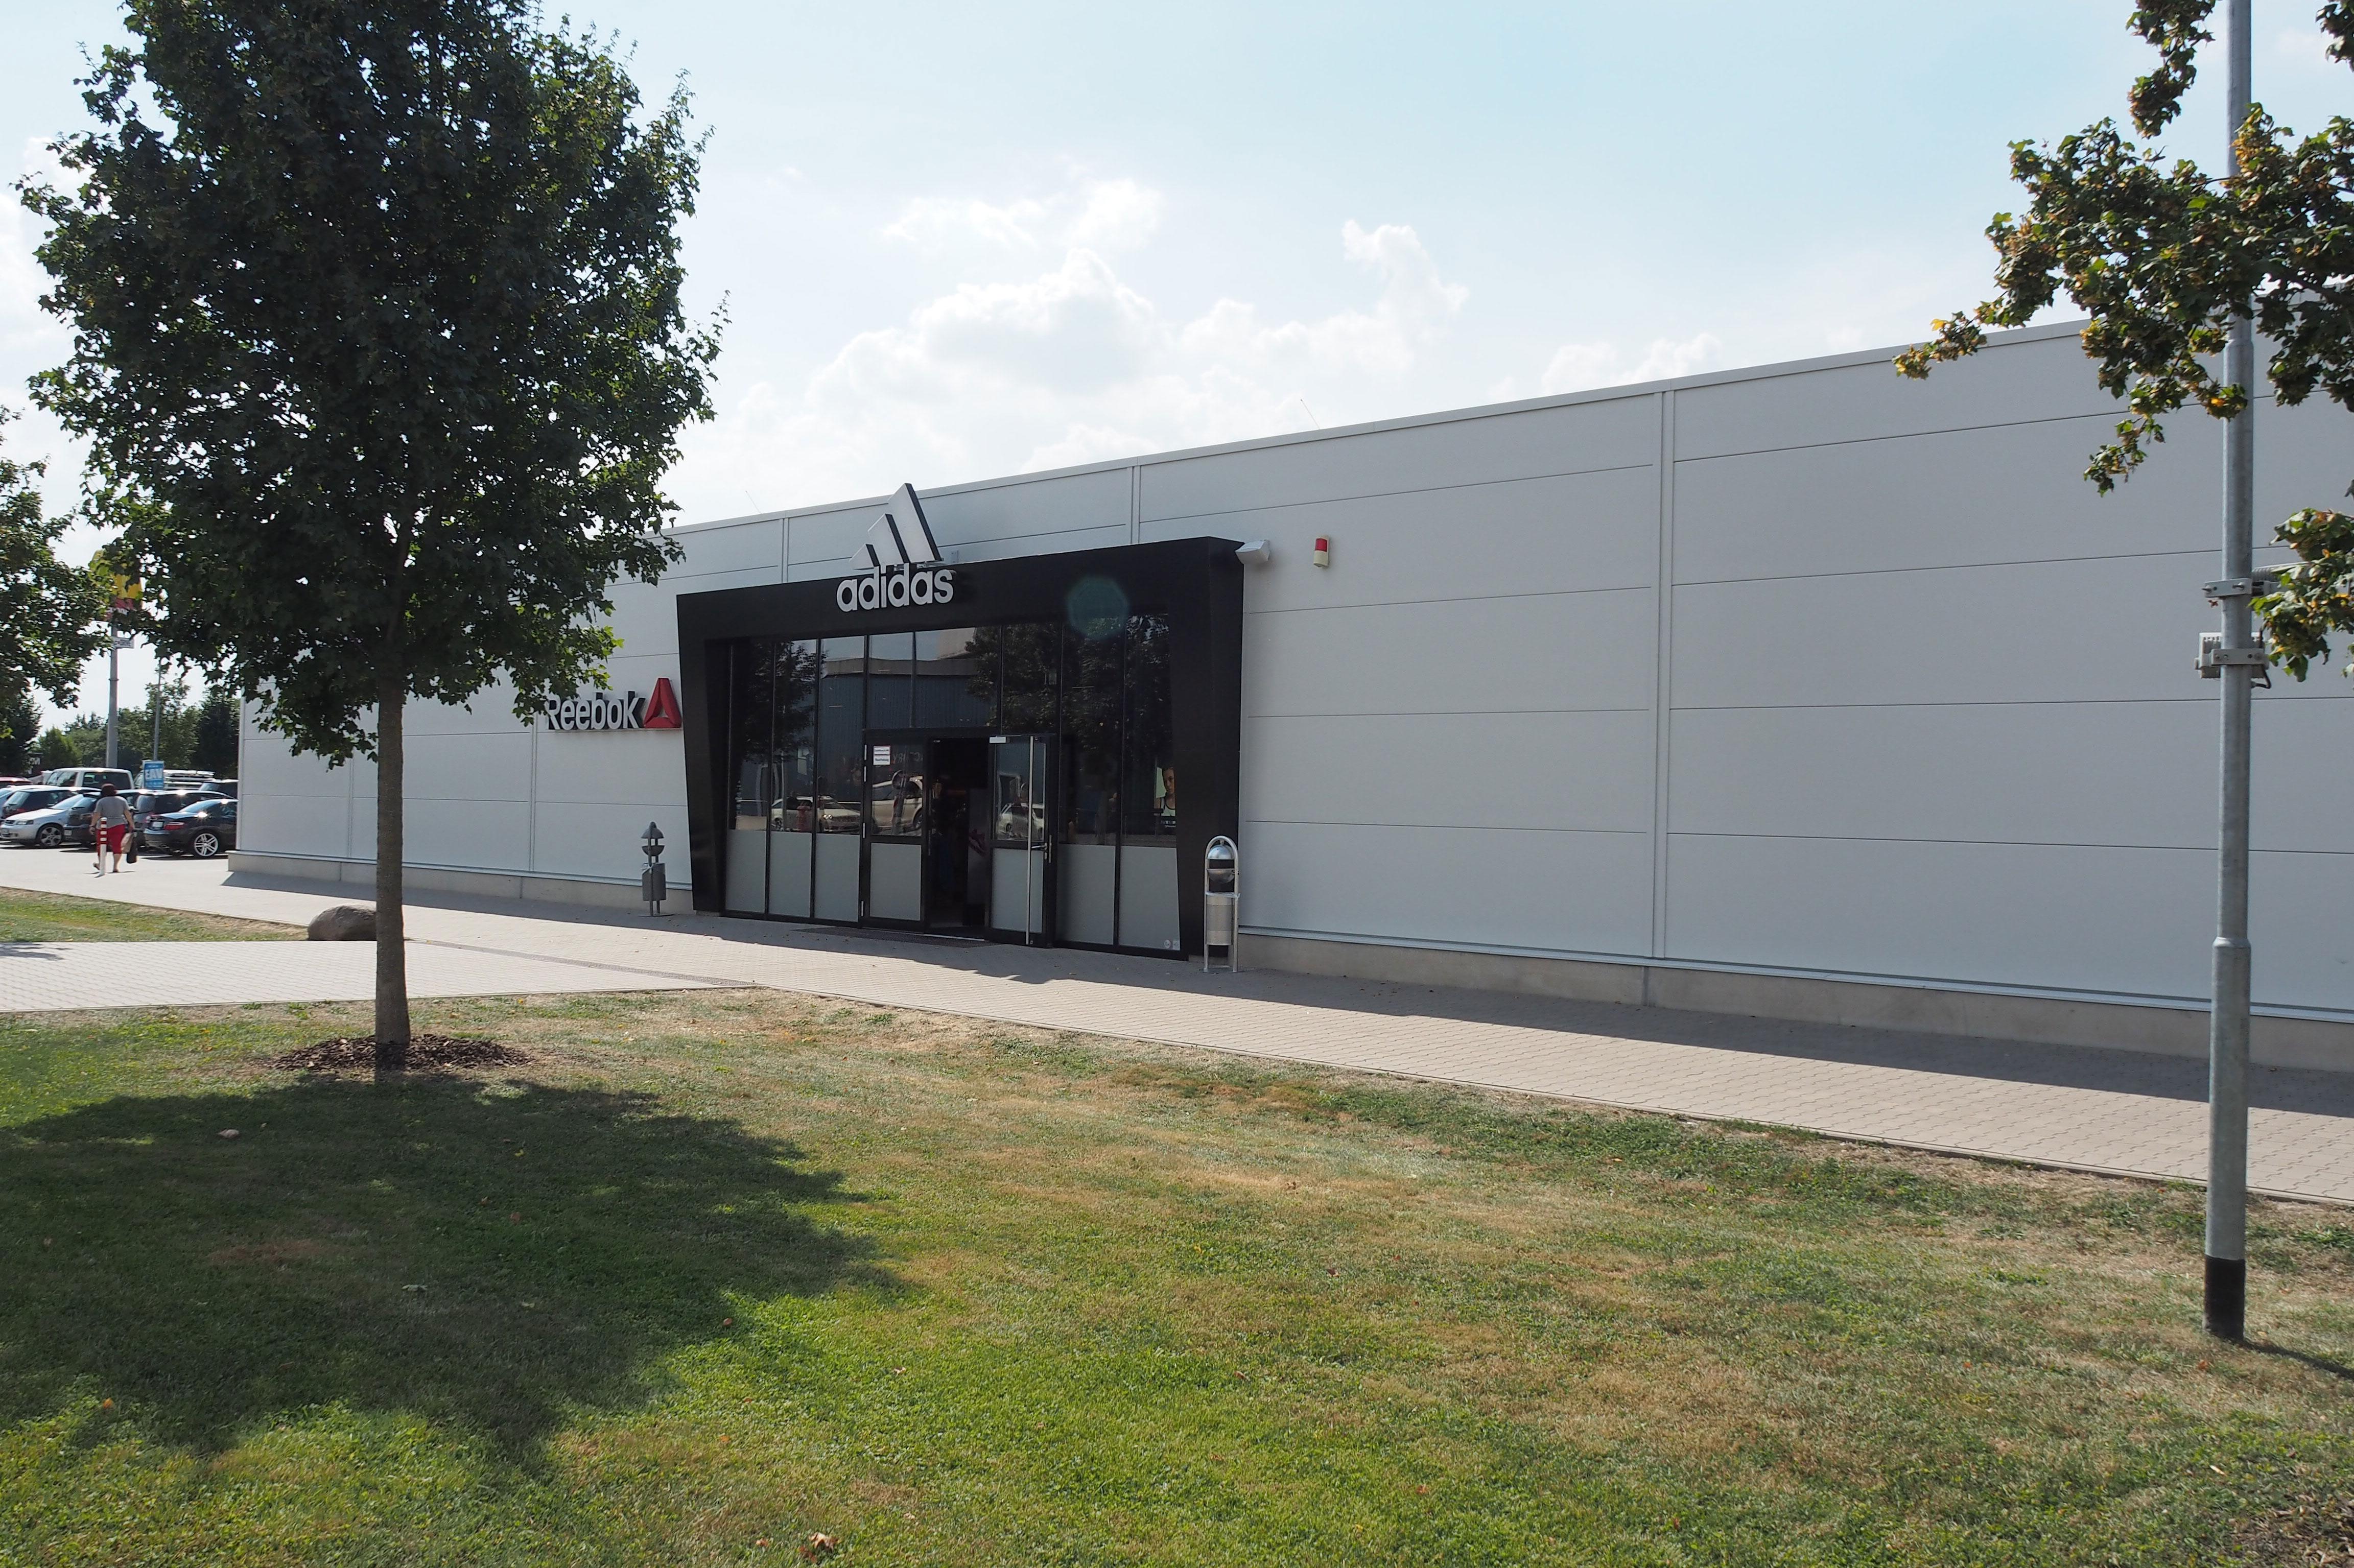 c5e9ae1623a39 adidas & Reebok Brand Store